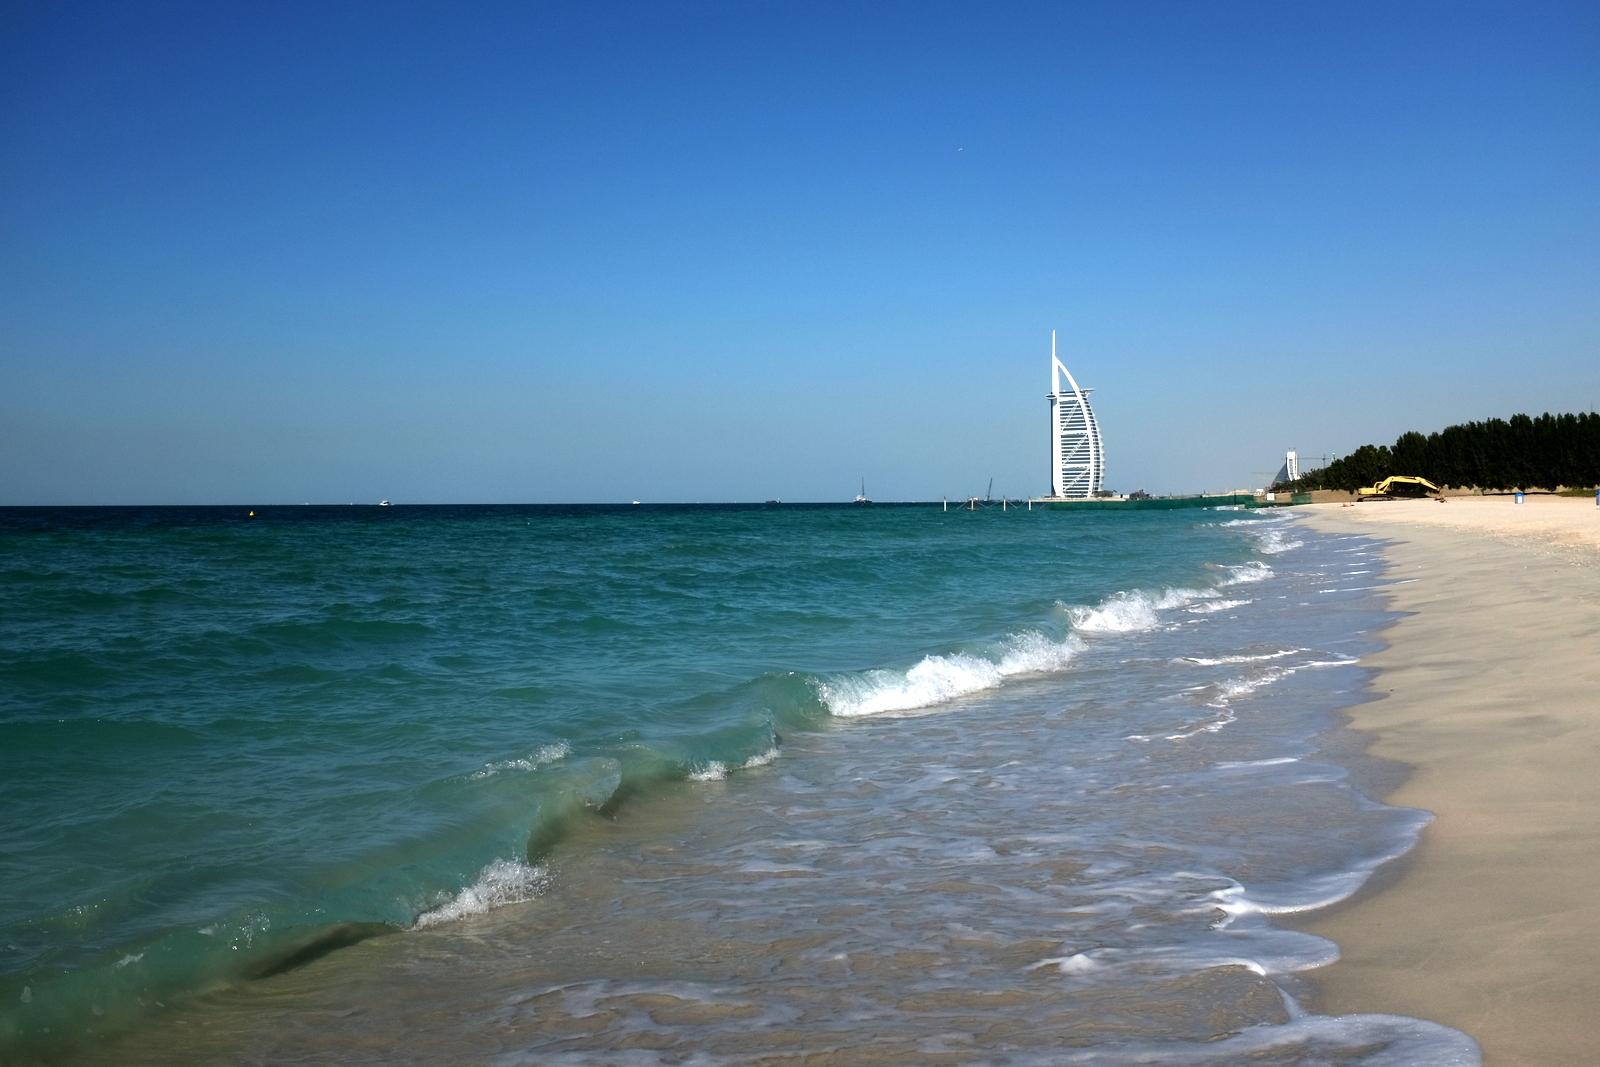 Burj Al Arab from the beach